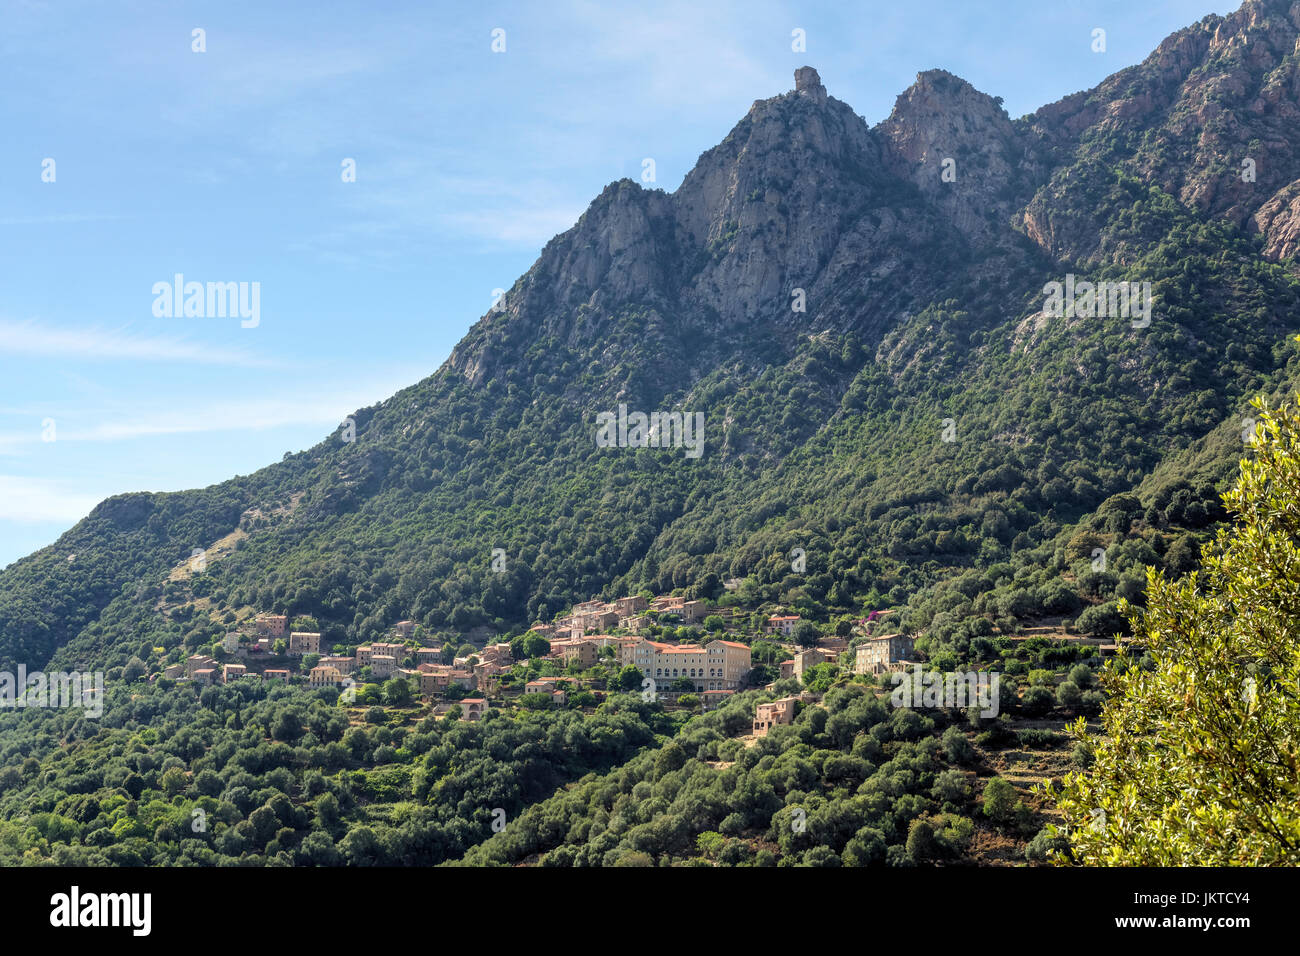 Ota, Corsica, France - Stock Image